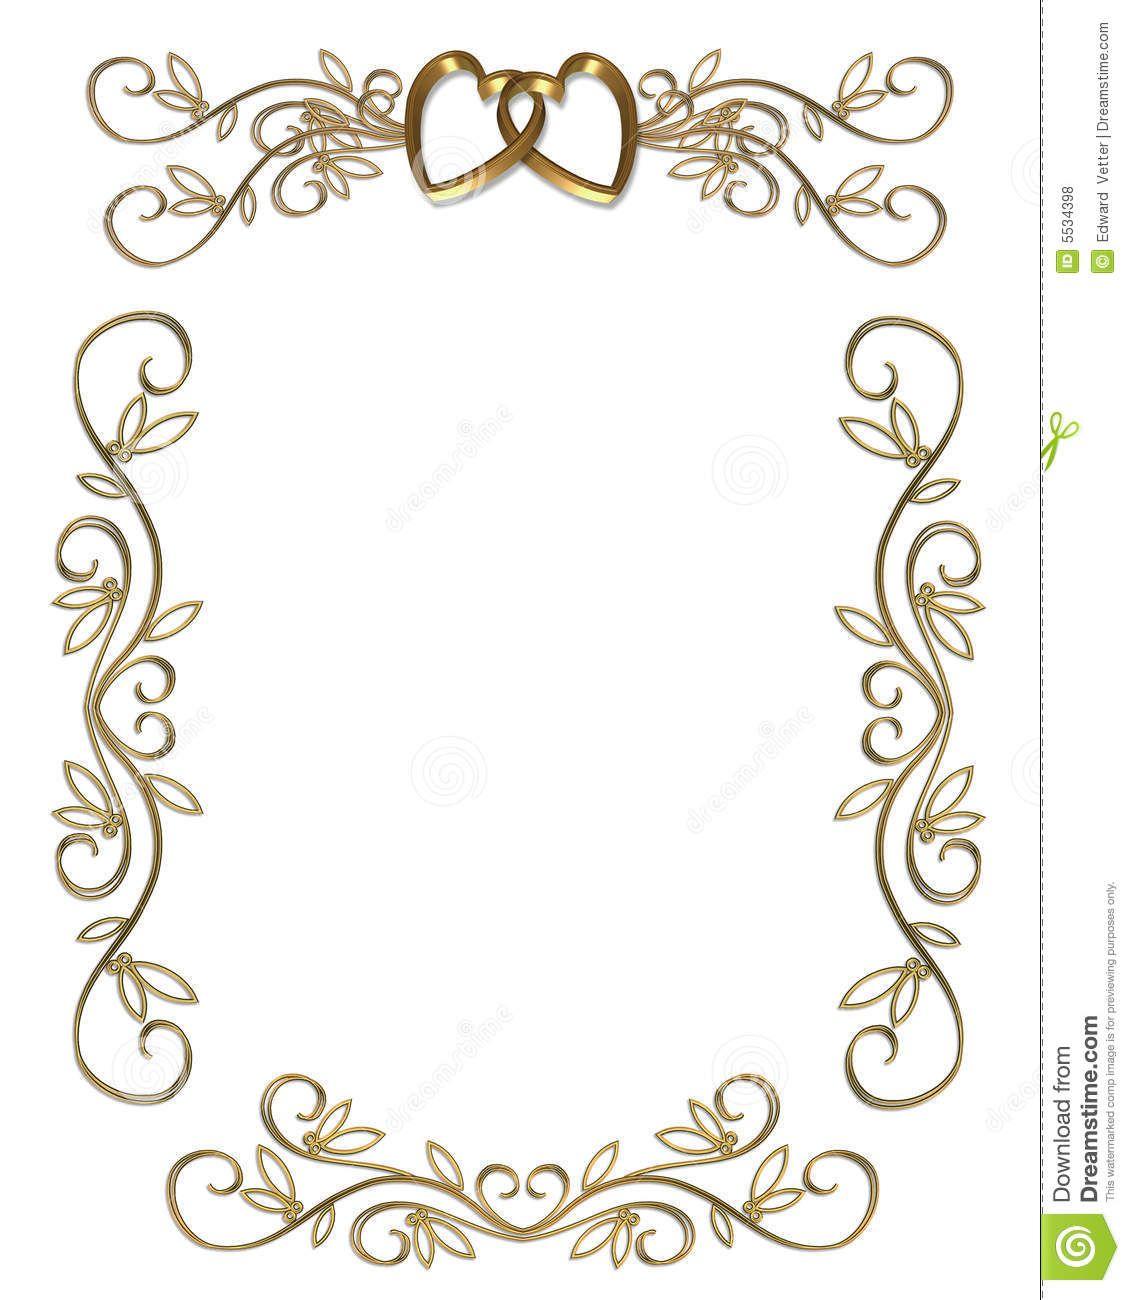 Image result for wedding program borders free download.